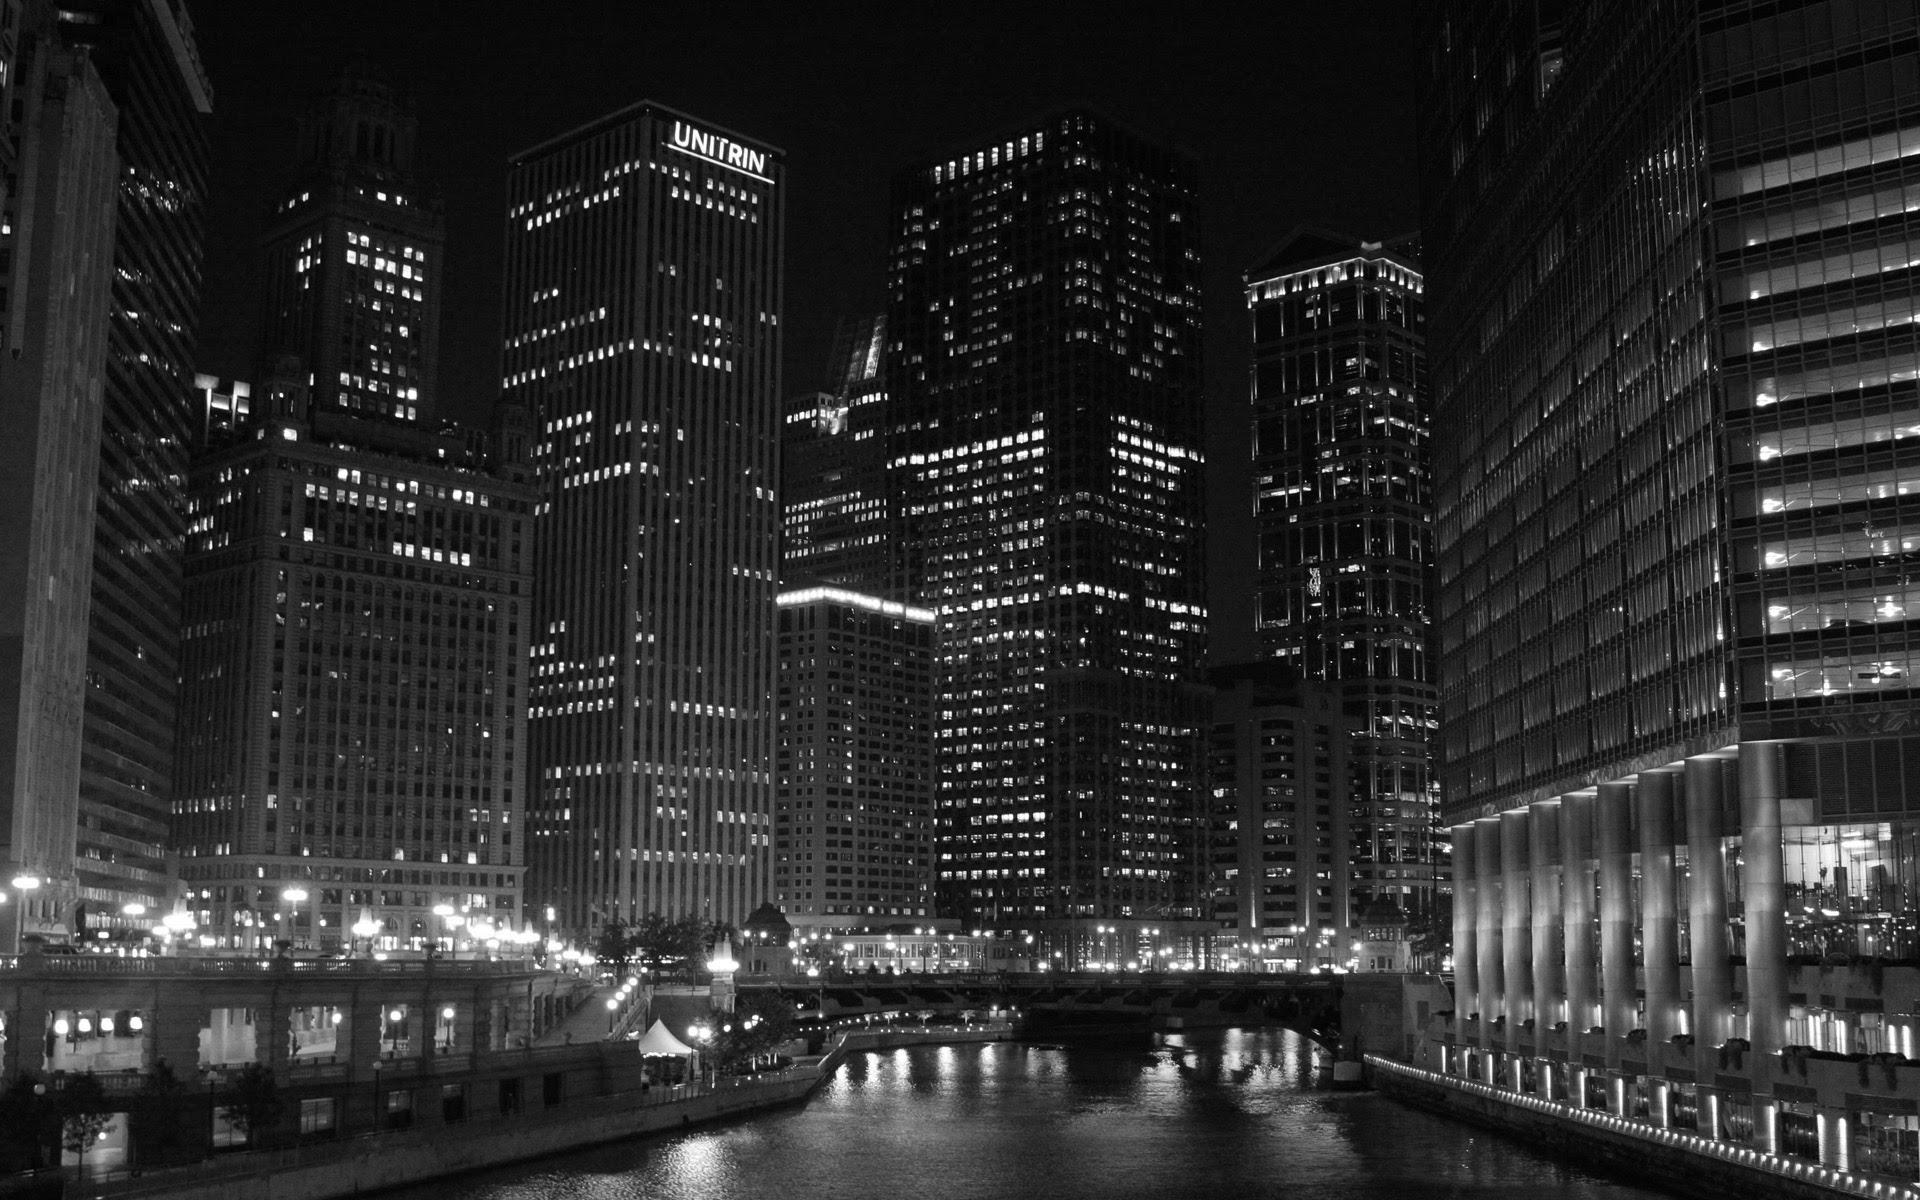 Chicago Black And White Background Hd Wallpaper Garreco Dental